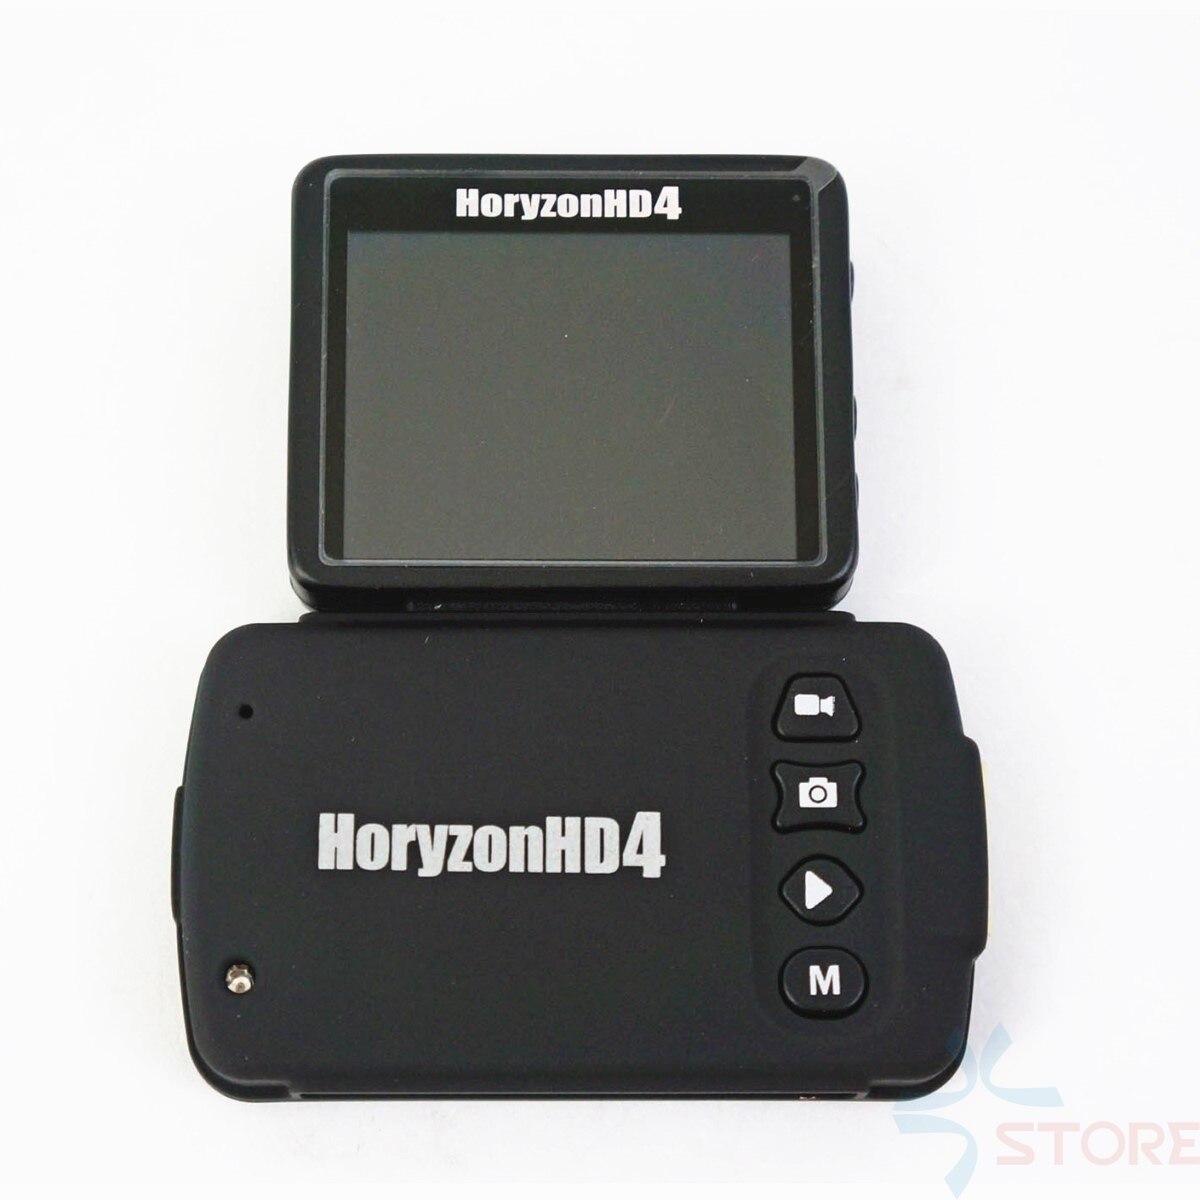 Foxtech HoryzonHD Full HD V4 1080P 14 megapíxeles alta definición FPV Cámara w/DVR 140 Deg lente gran angular especialmente para la foto FPV